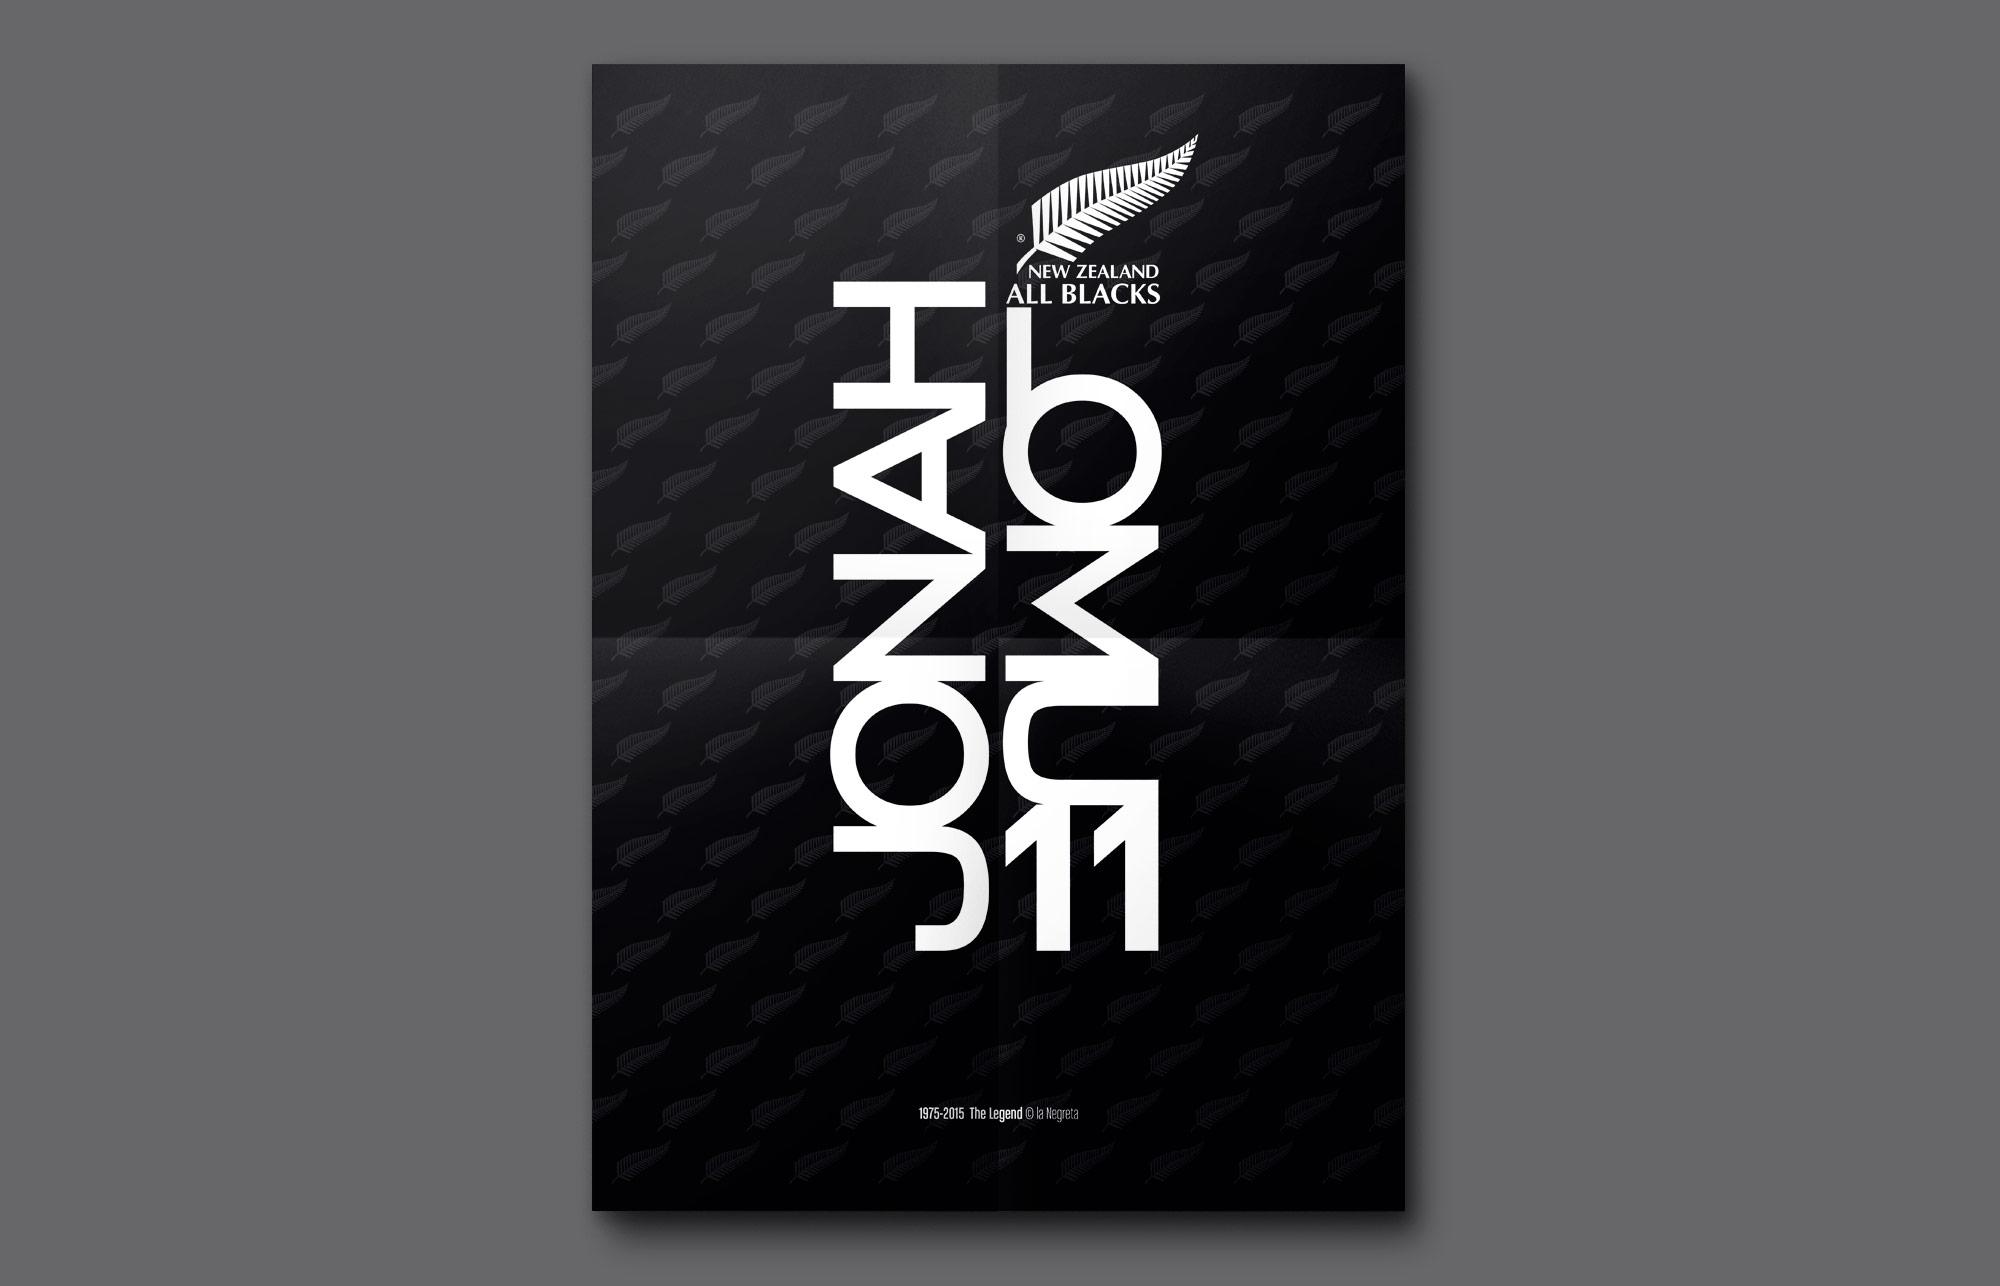 la negreta, jonah lomu, barcelona, disseny gràfic, all blacks